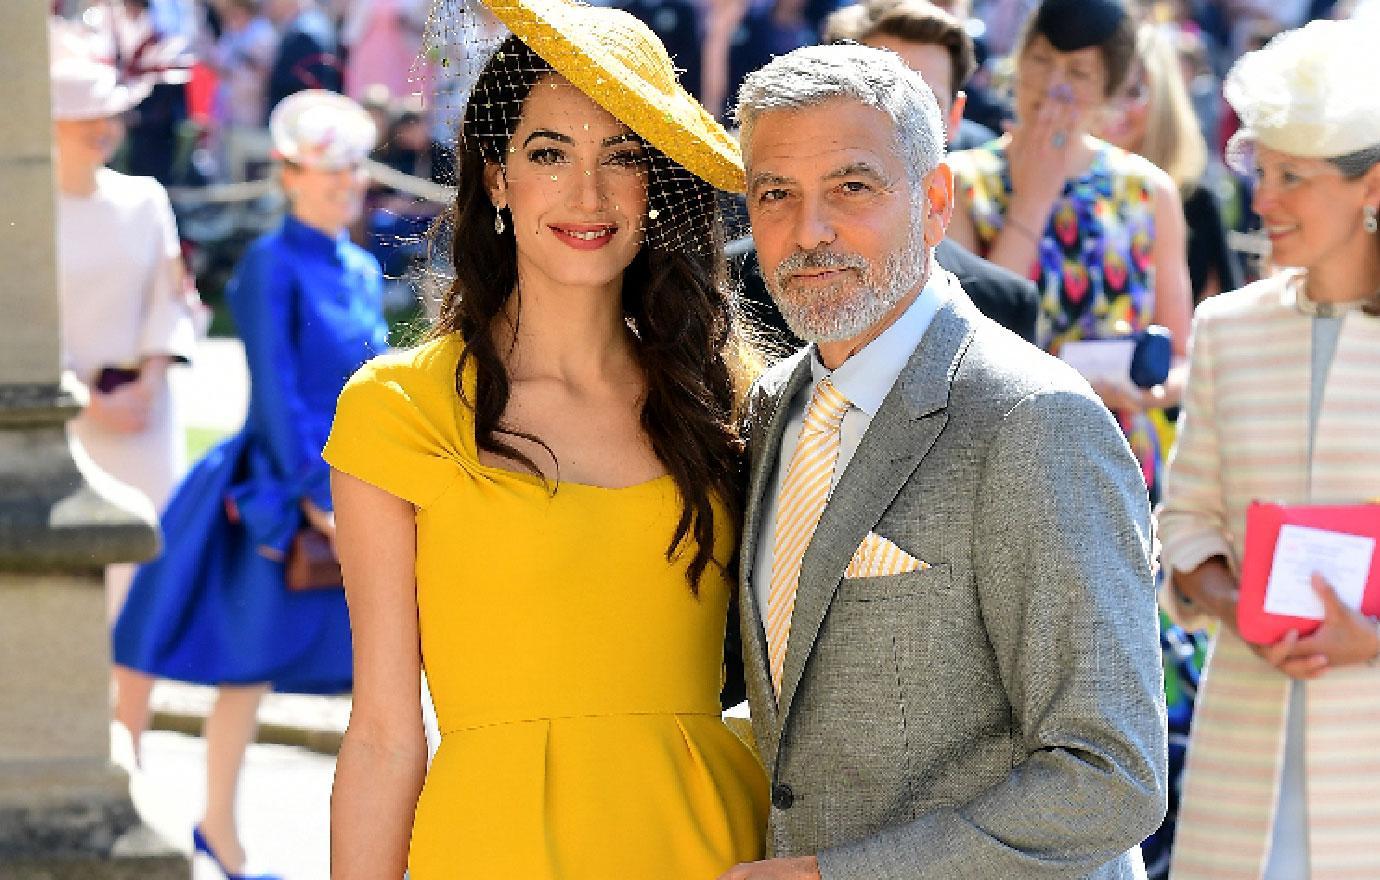 royal wedding celebrity arrivals photos